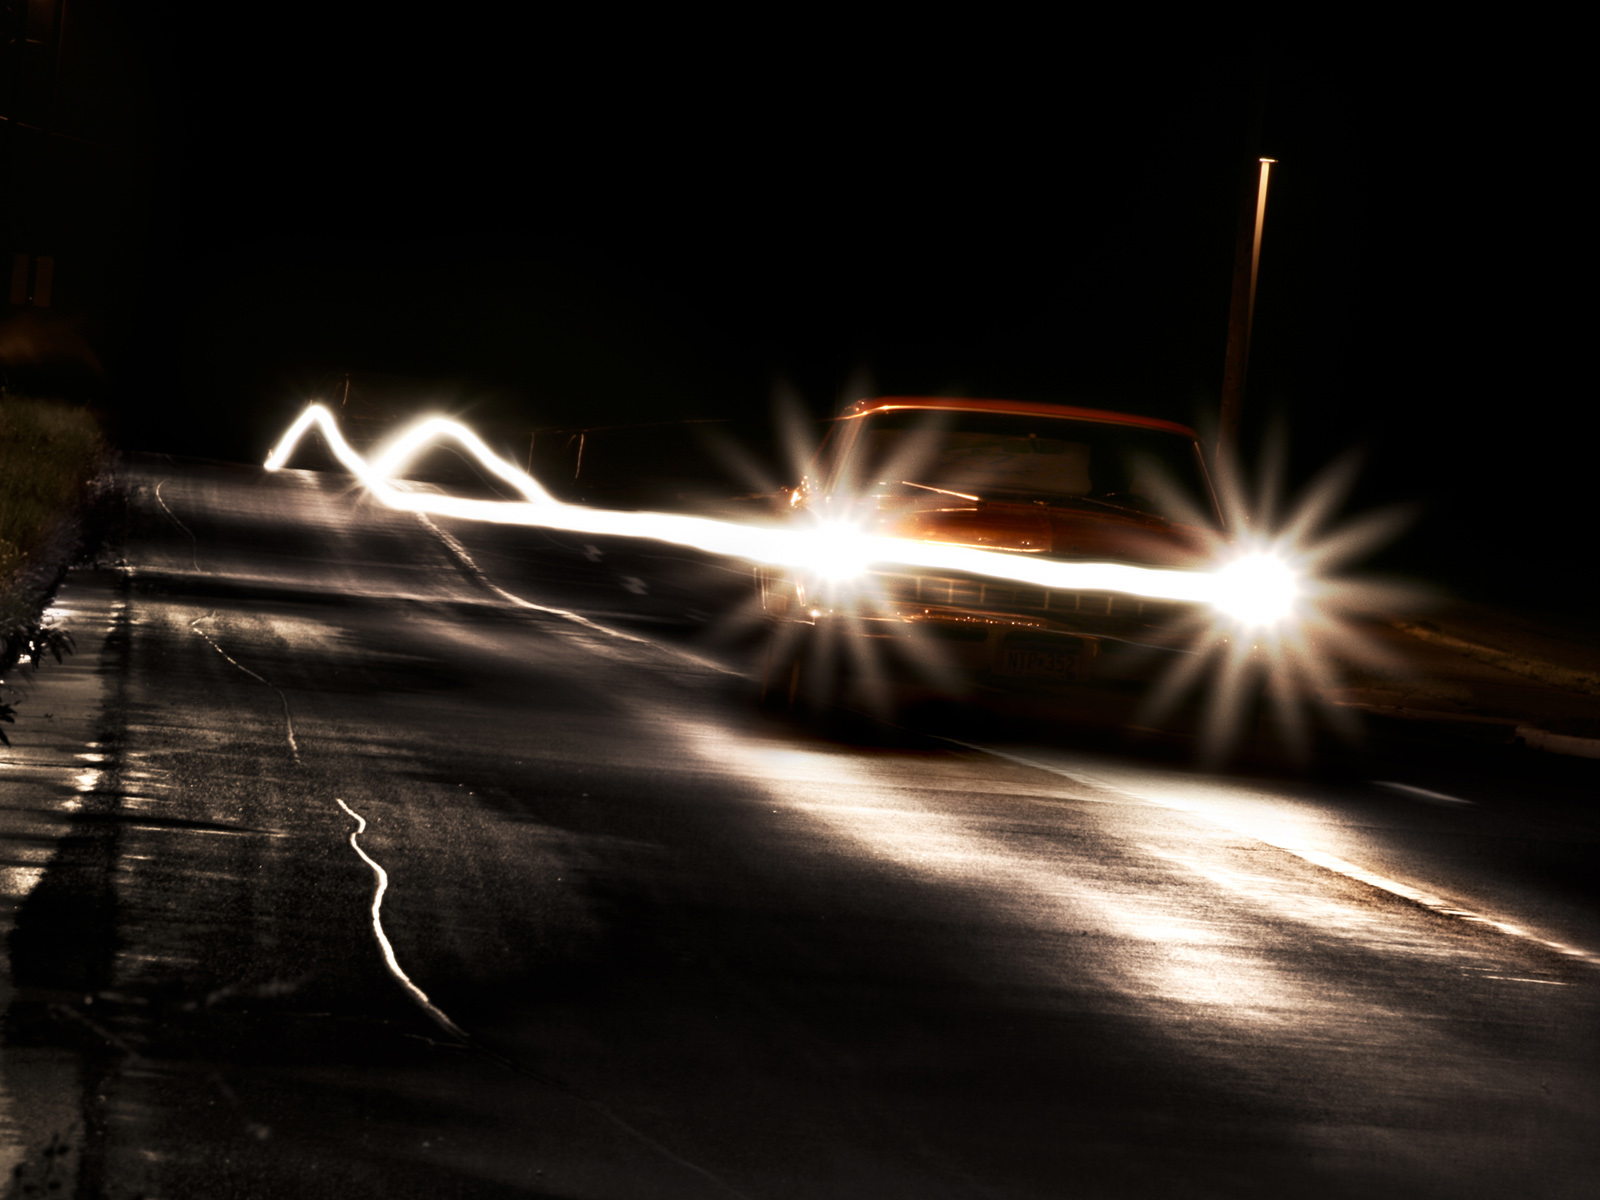 phares de voiture